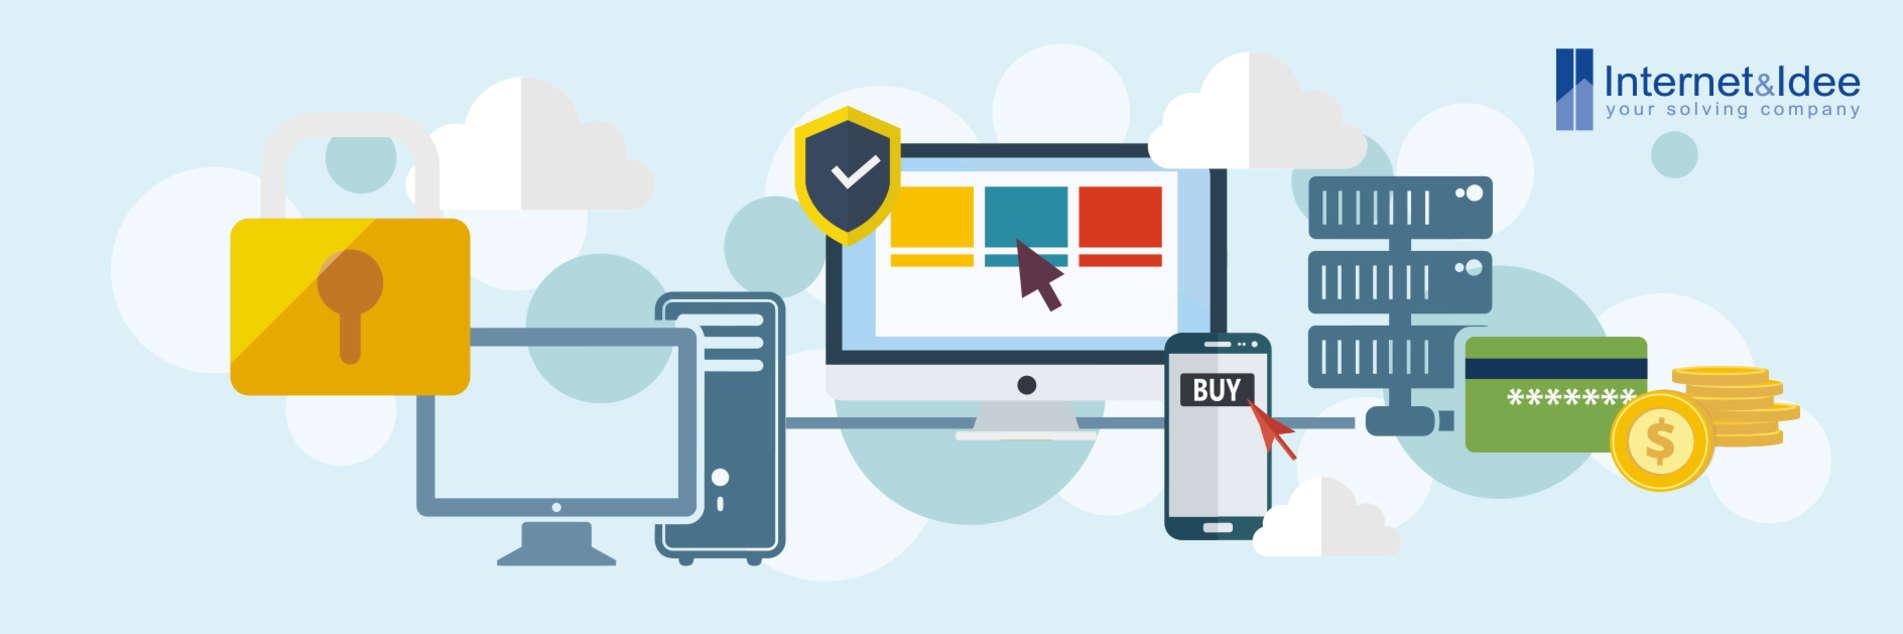 Media & Entertainment: digital innovation for a growing market